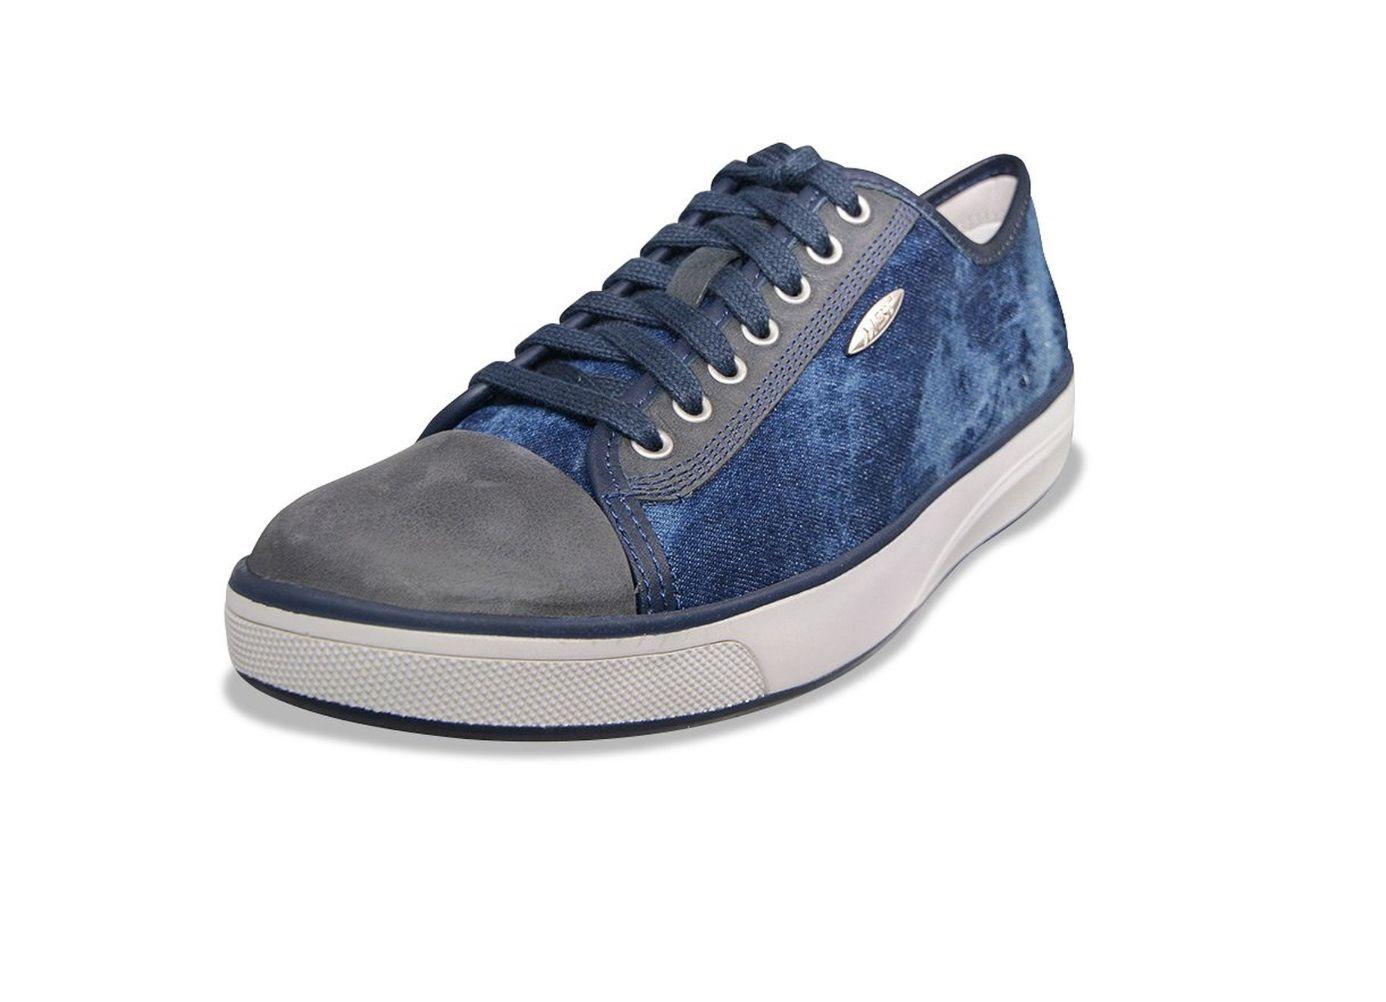 MBT Donna Donna Donna  Jambo Athletic Walking scarpe (Sz_37) 3c2b05